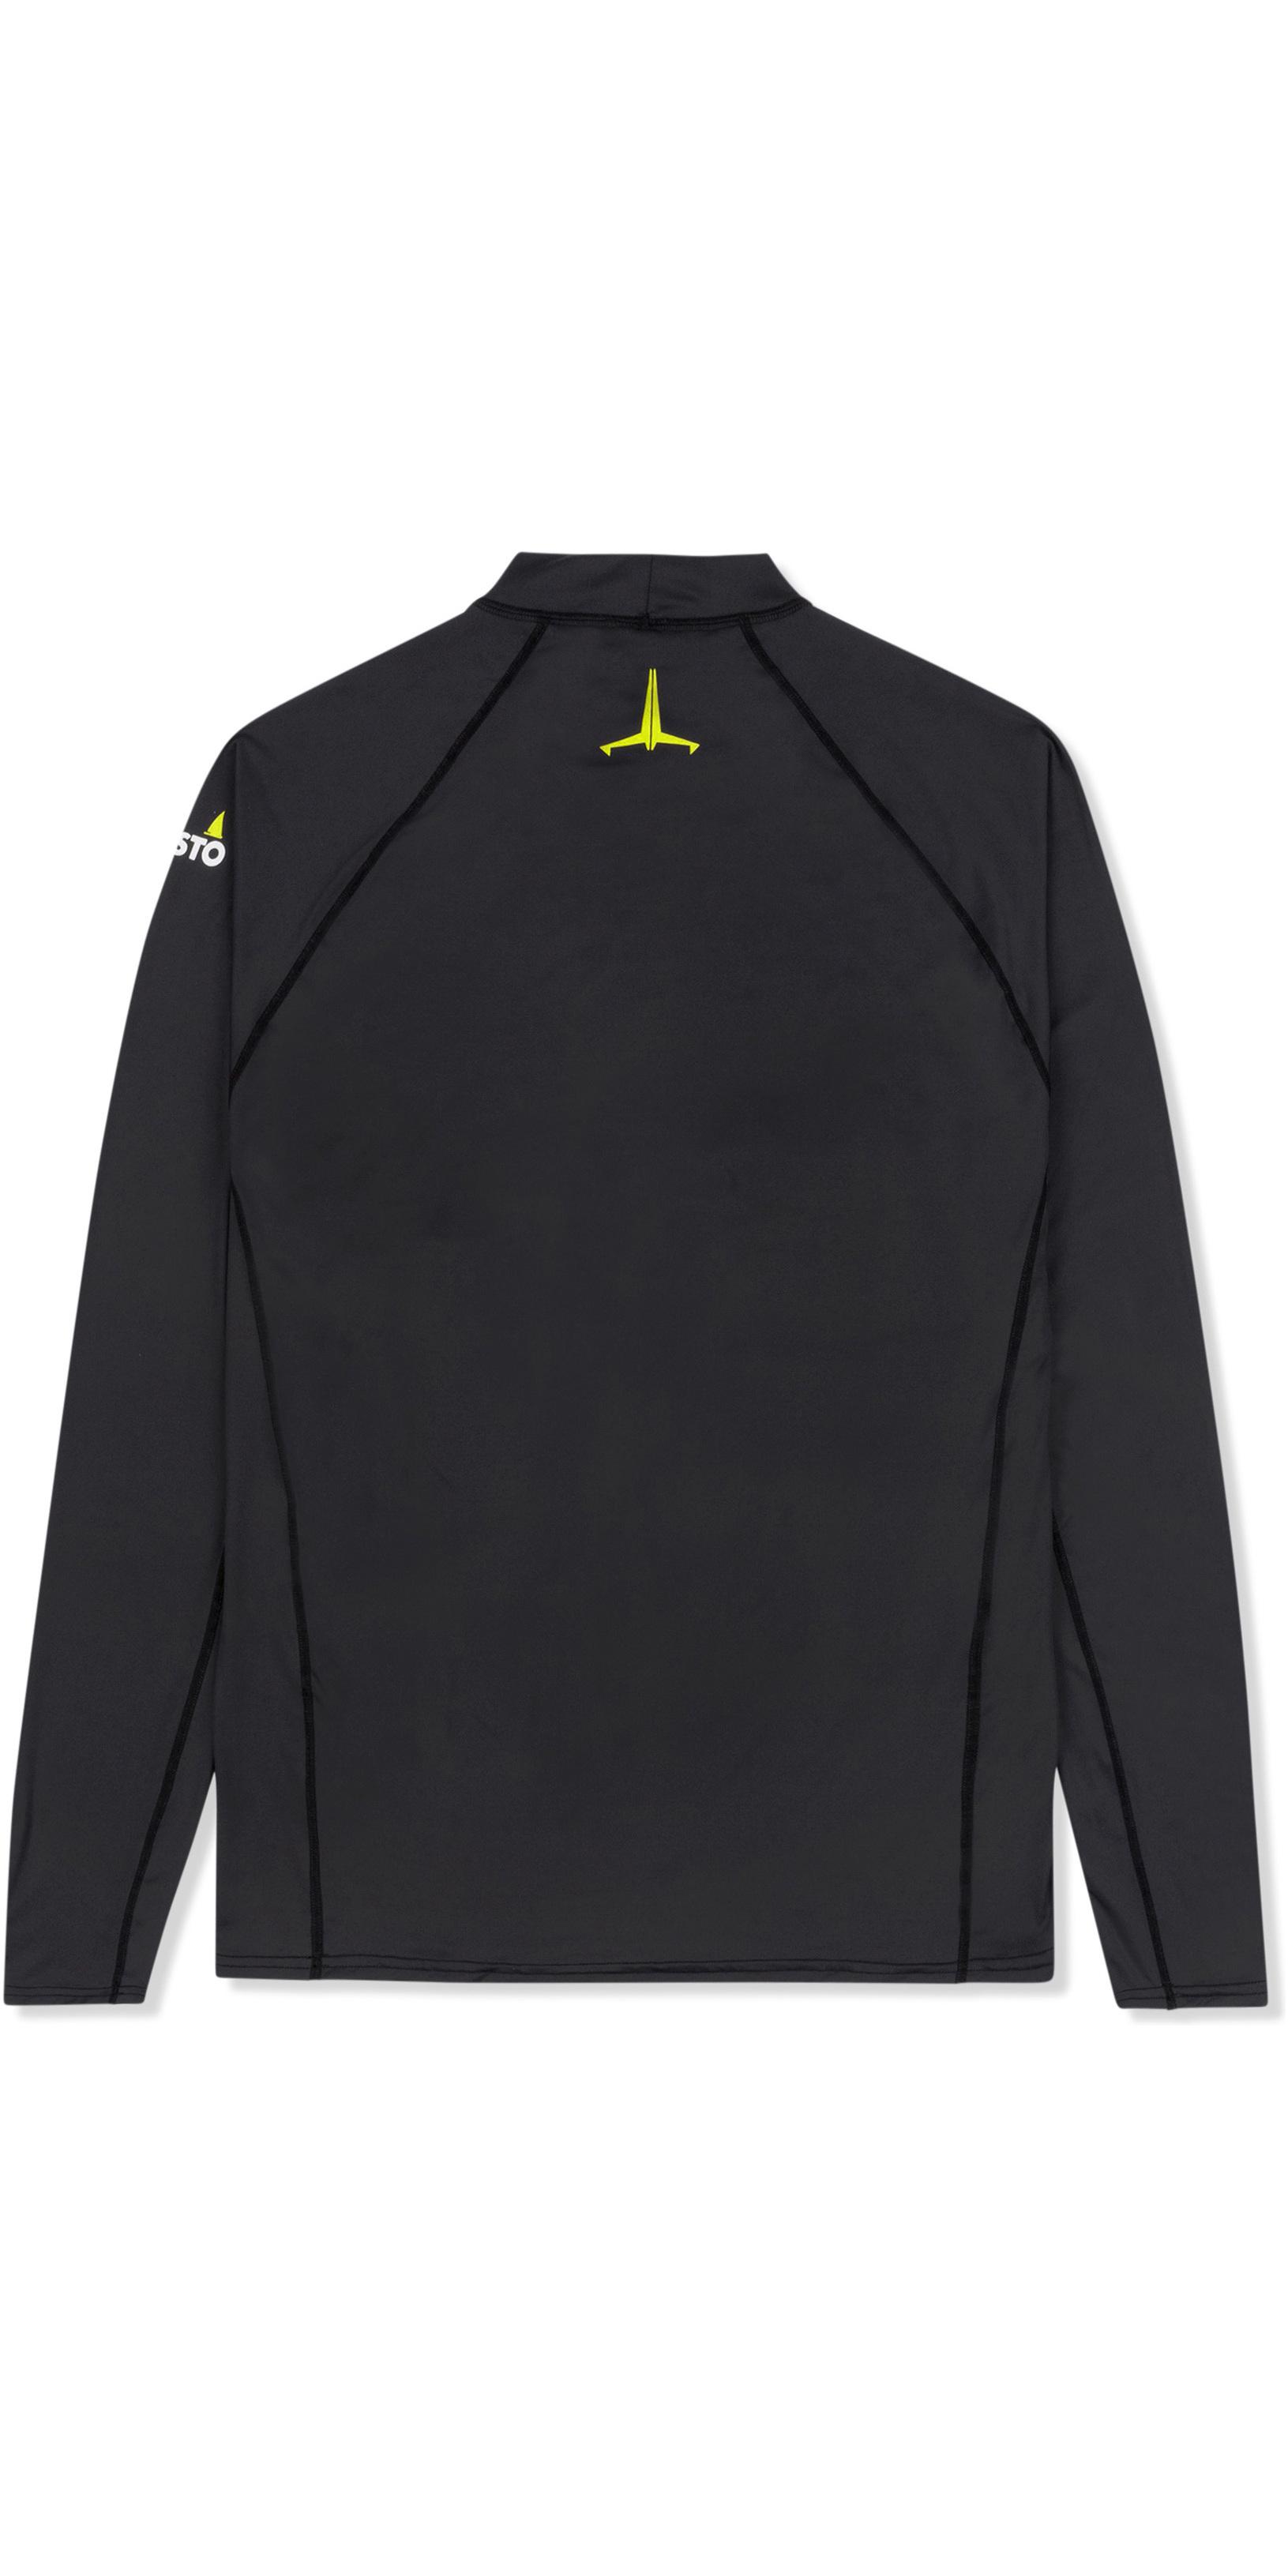 2019 Musto Mens Insignia UV Fast Dry Long Sleeve T-Shirt Black SUTS010